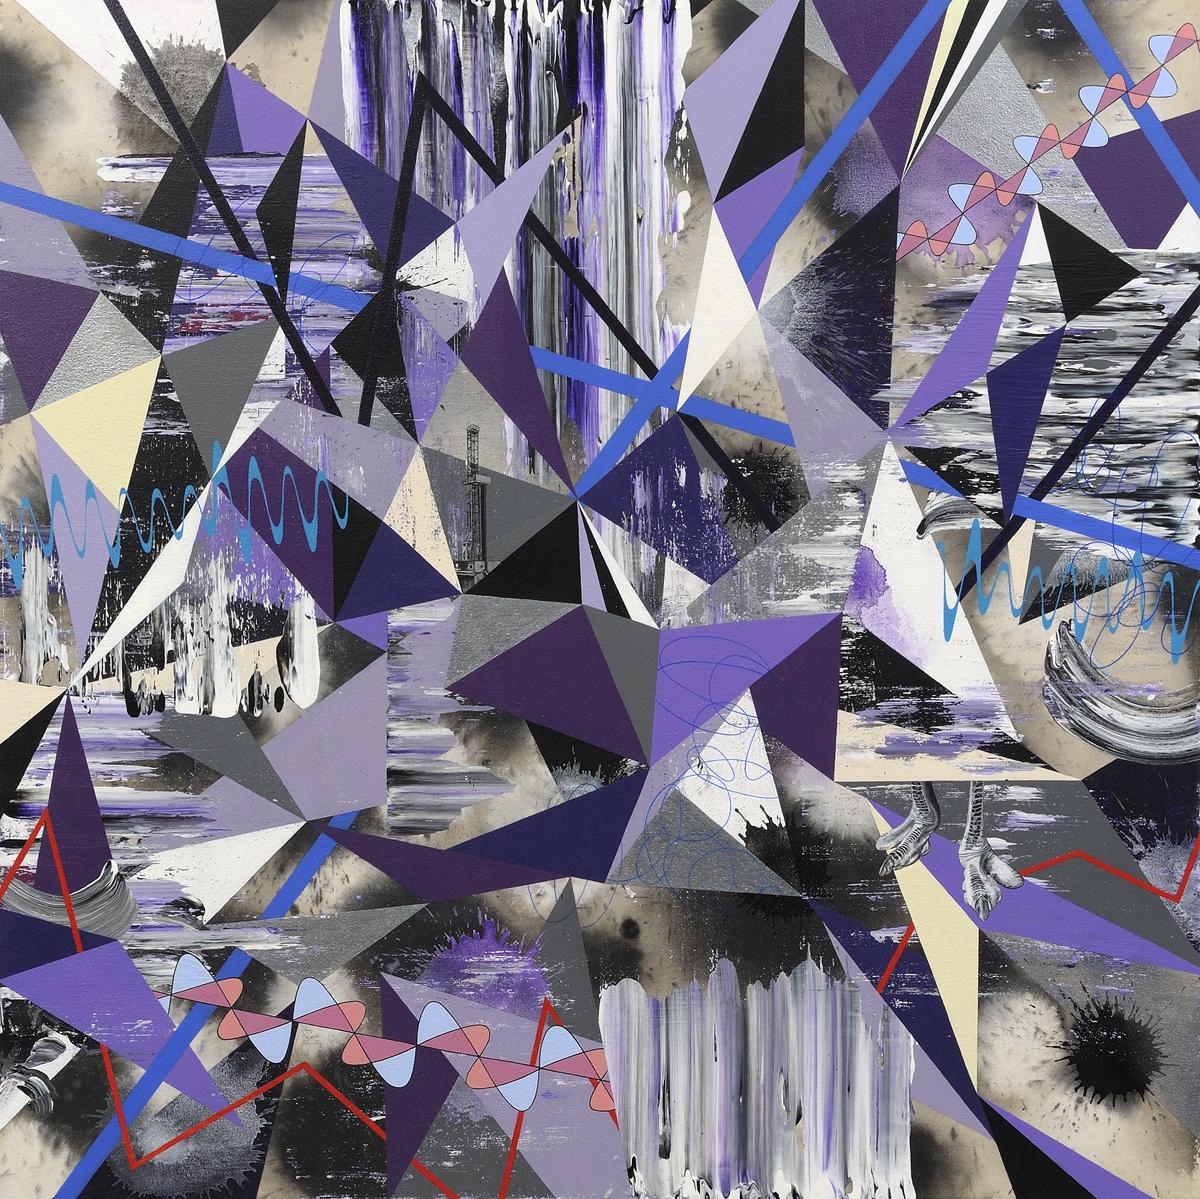 Kara Maria, Anthropocene Shuffle, 2014, acrylic on canvas, 46 x 46 inches